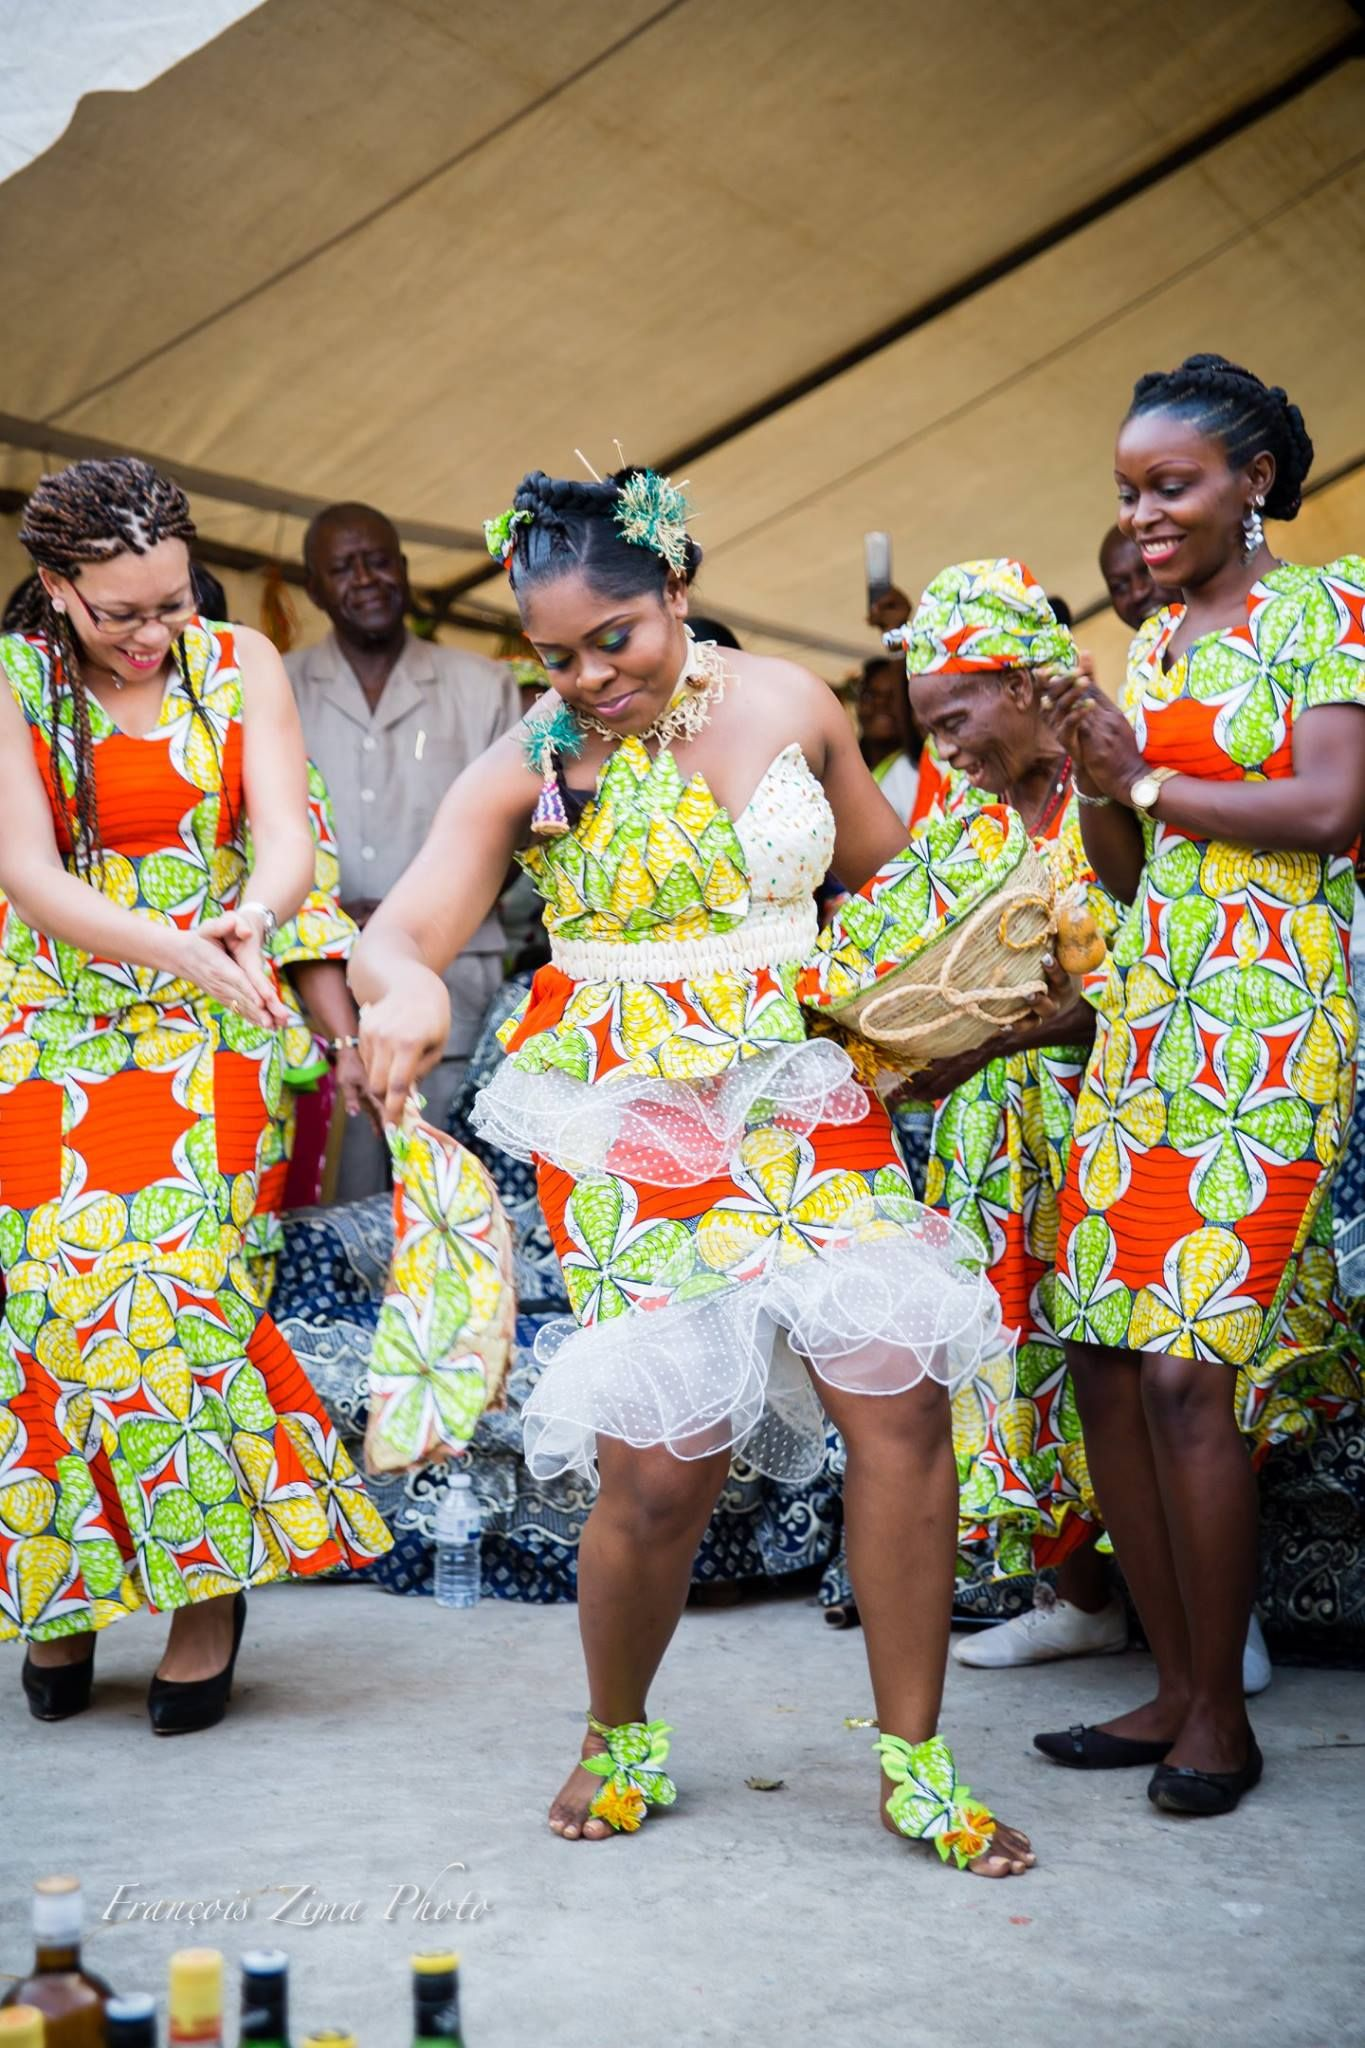 Mariage Traditionnel Gabonais Mariage Traditionnel En 2019